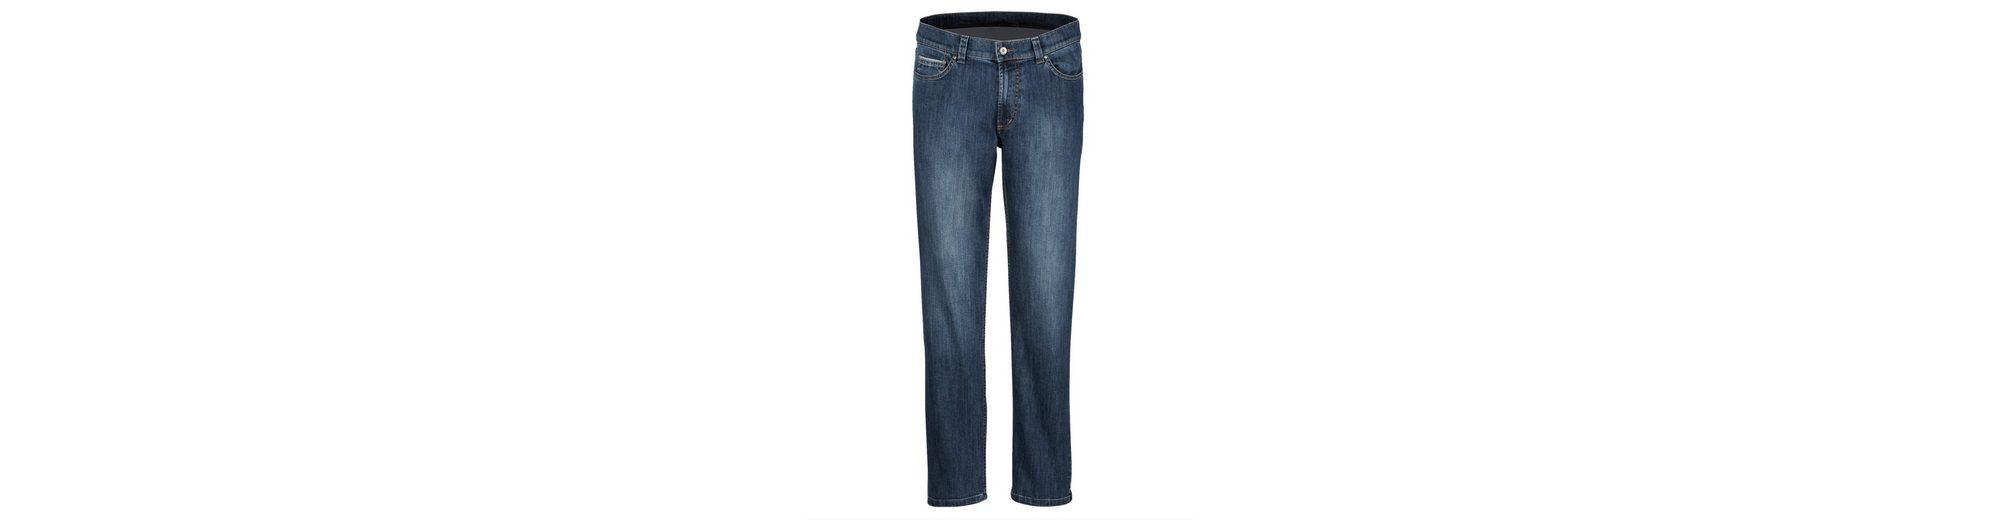 in Babista Passform Jeans in schmalerer Passform Jeans Babista in schmalerer Jeans Babista Passform Babista schmalerer x1Bfqpwx